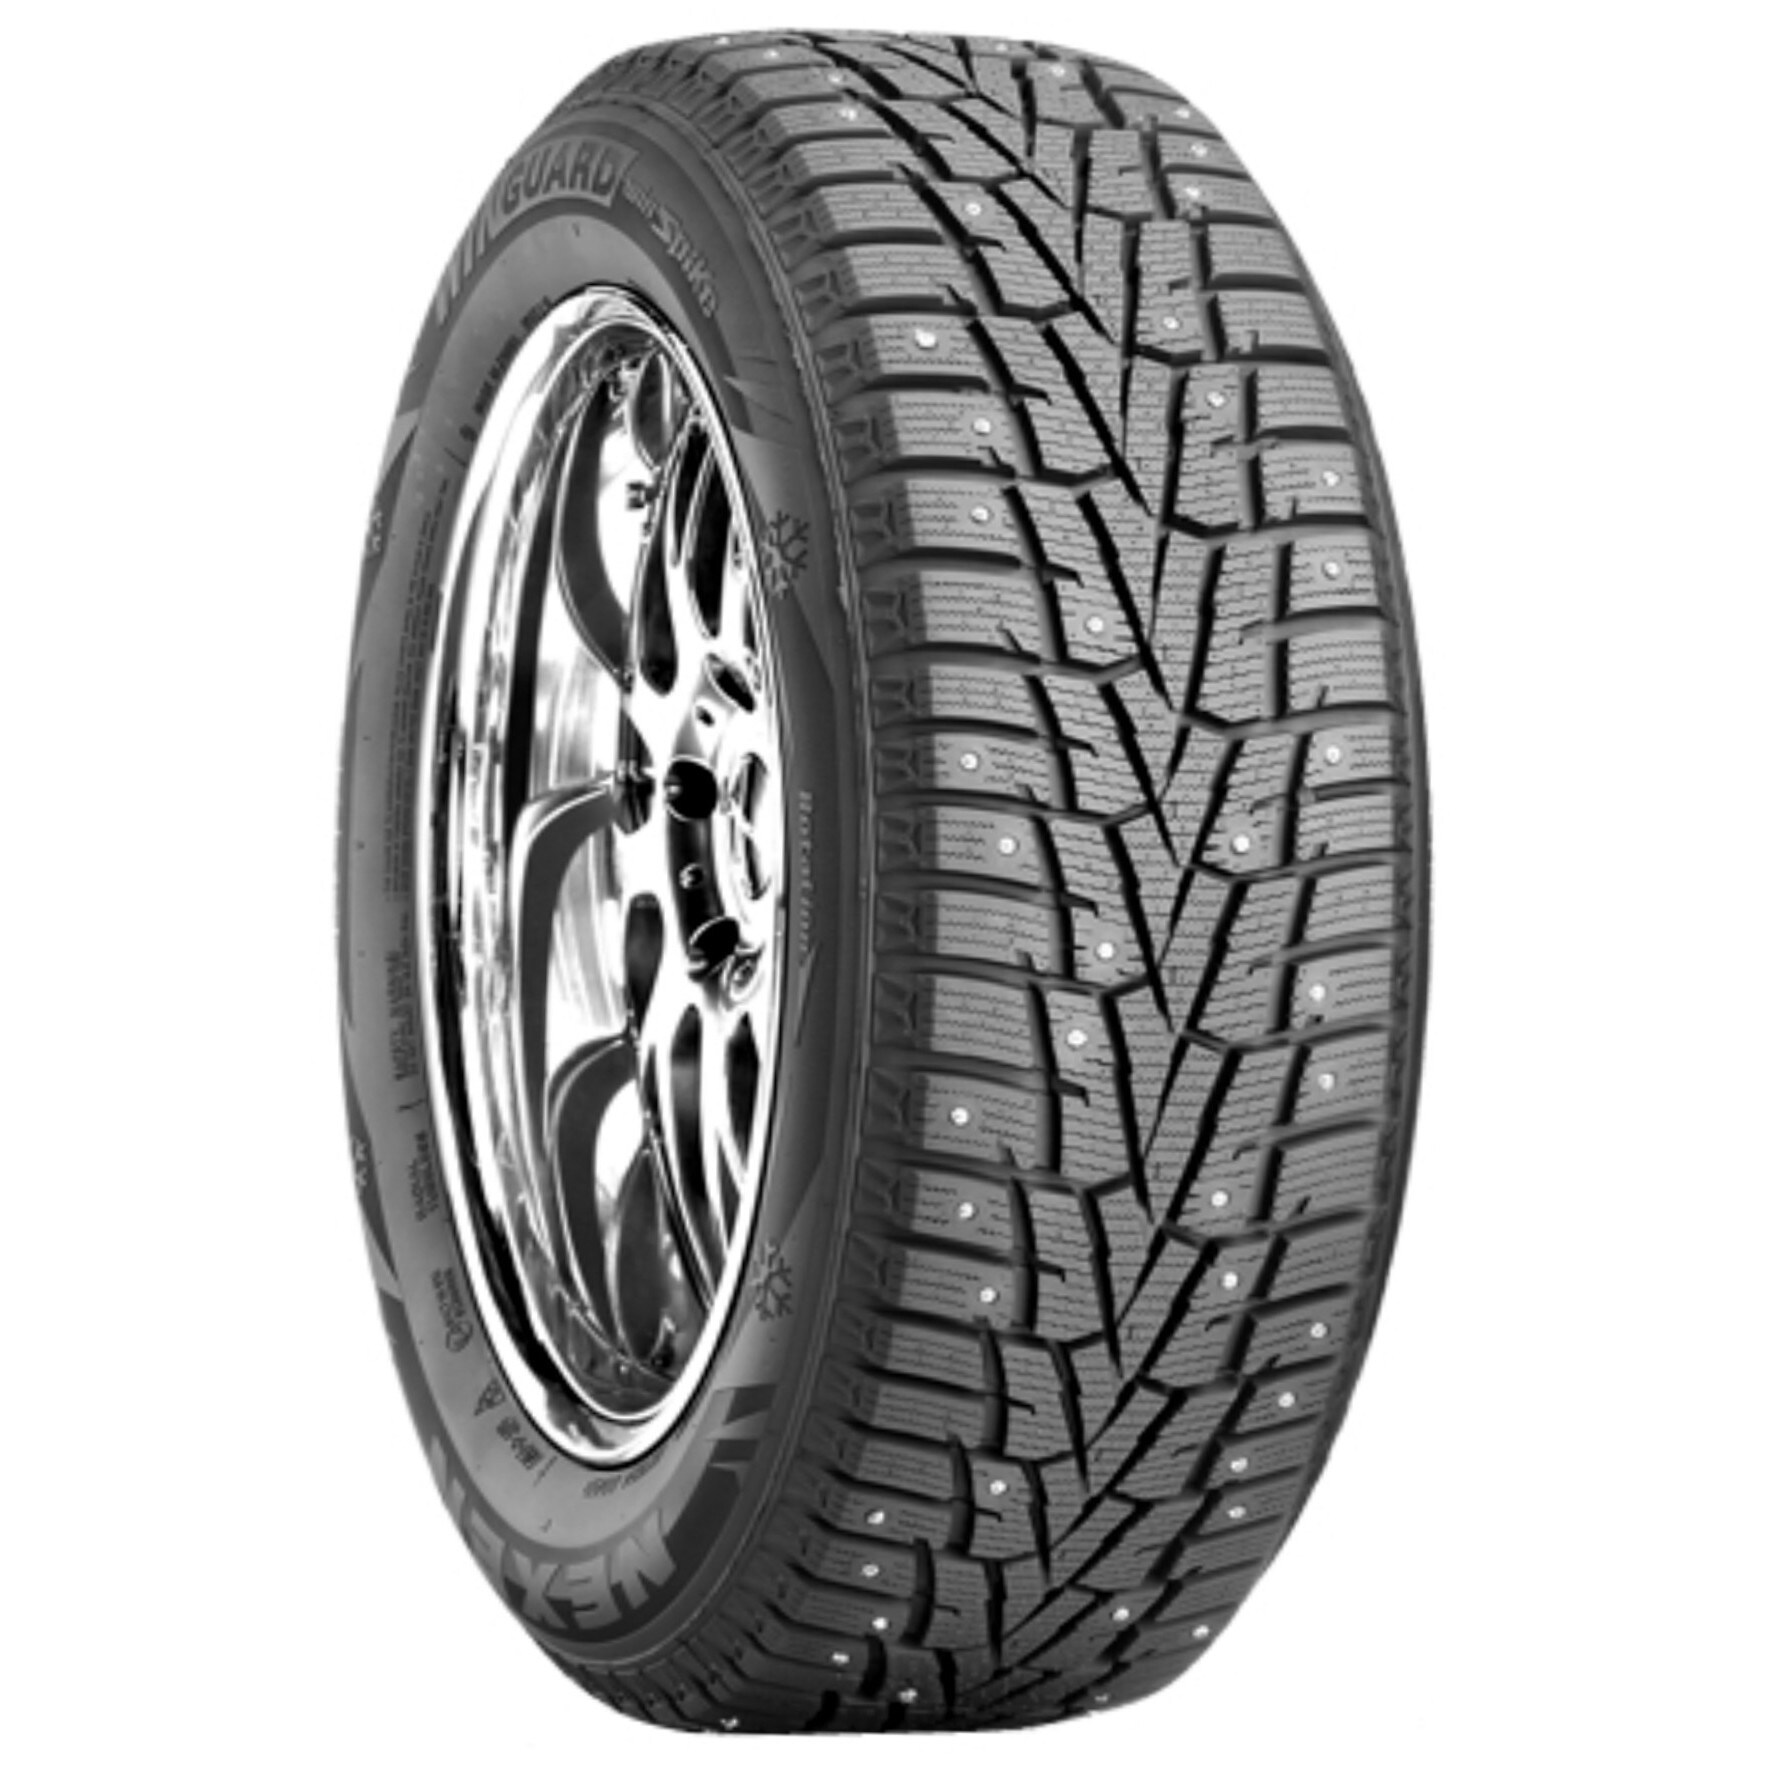 Nexen Winguard Winspike Winter Tire - LT265/75R16 LRE/10 ...